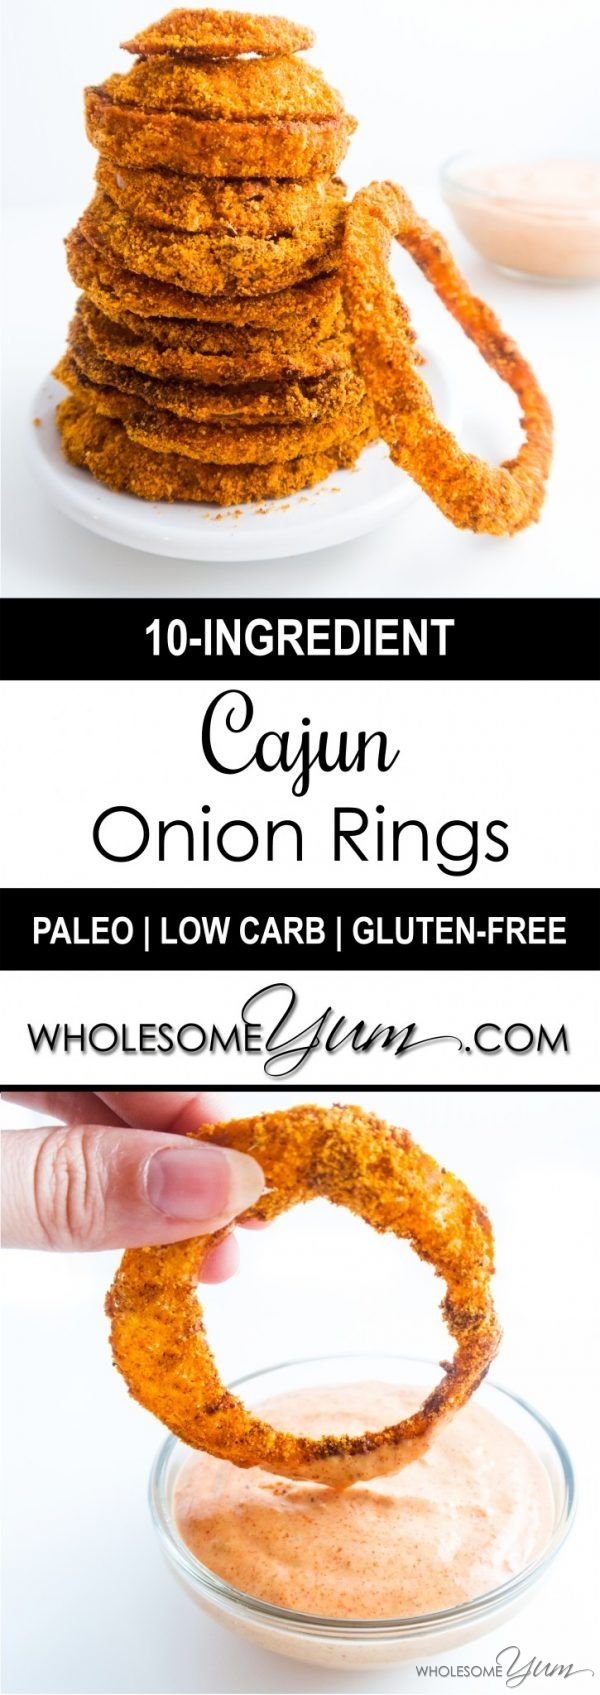 Cajun Onion Rings (Paleo, Low Carb)